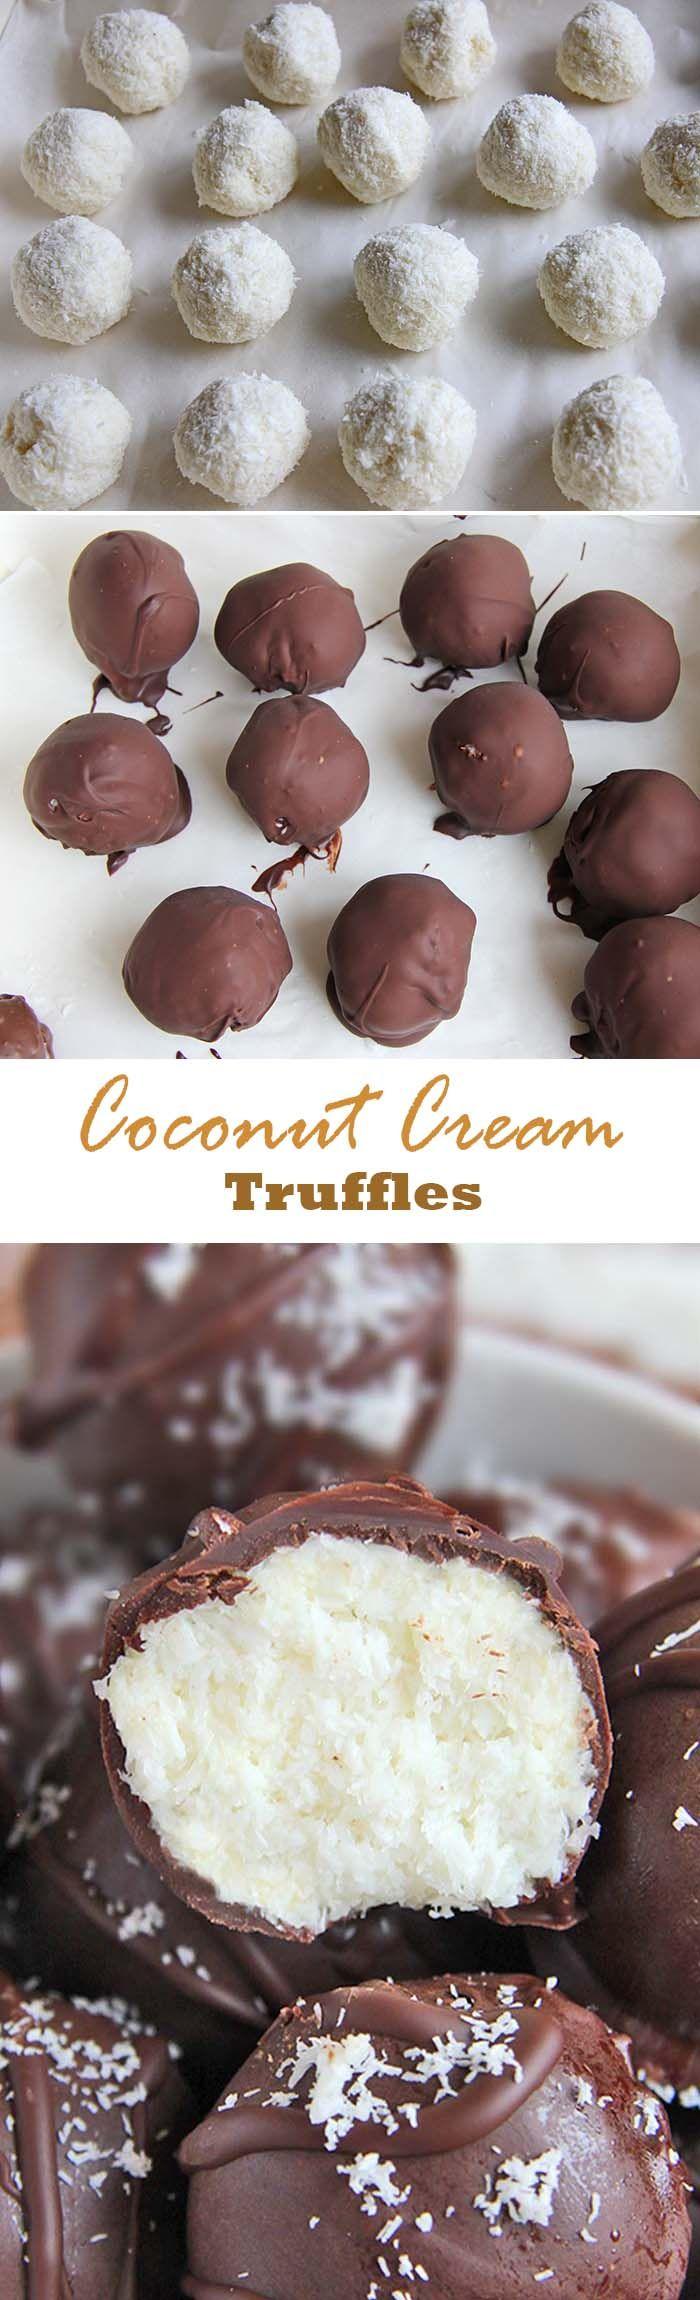 These easy chocolate coconut cream truffles are a coconut and chocolate lovers dream. #coconut #truffles #condensedmilk